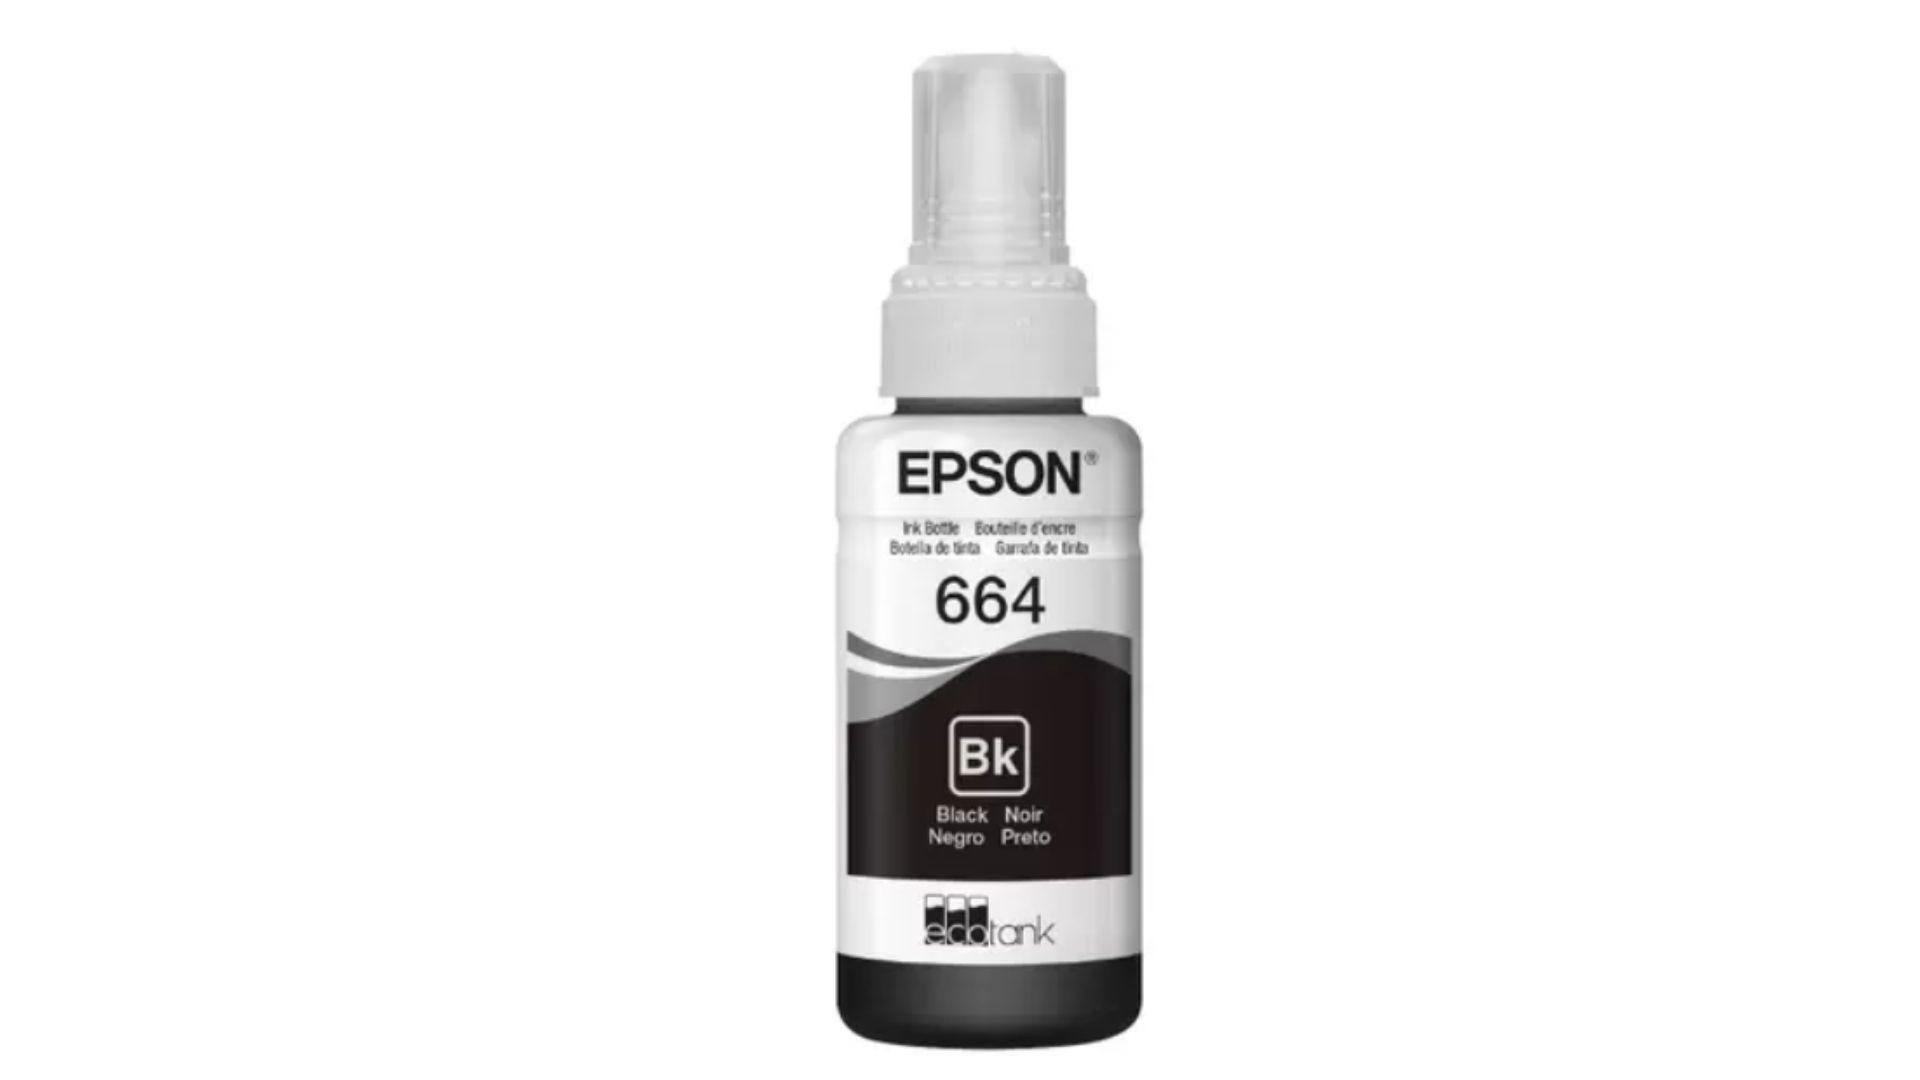 Garrafa de tinta preta Epson 664